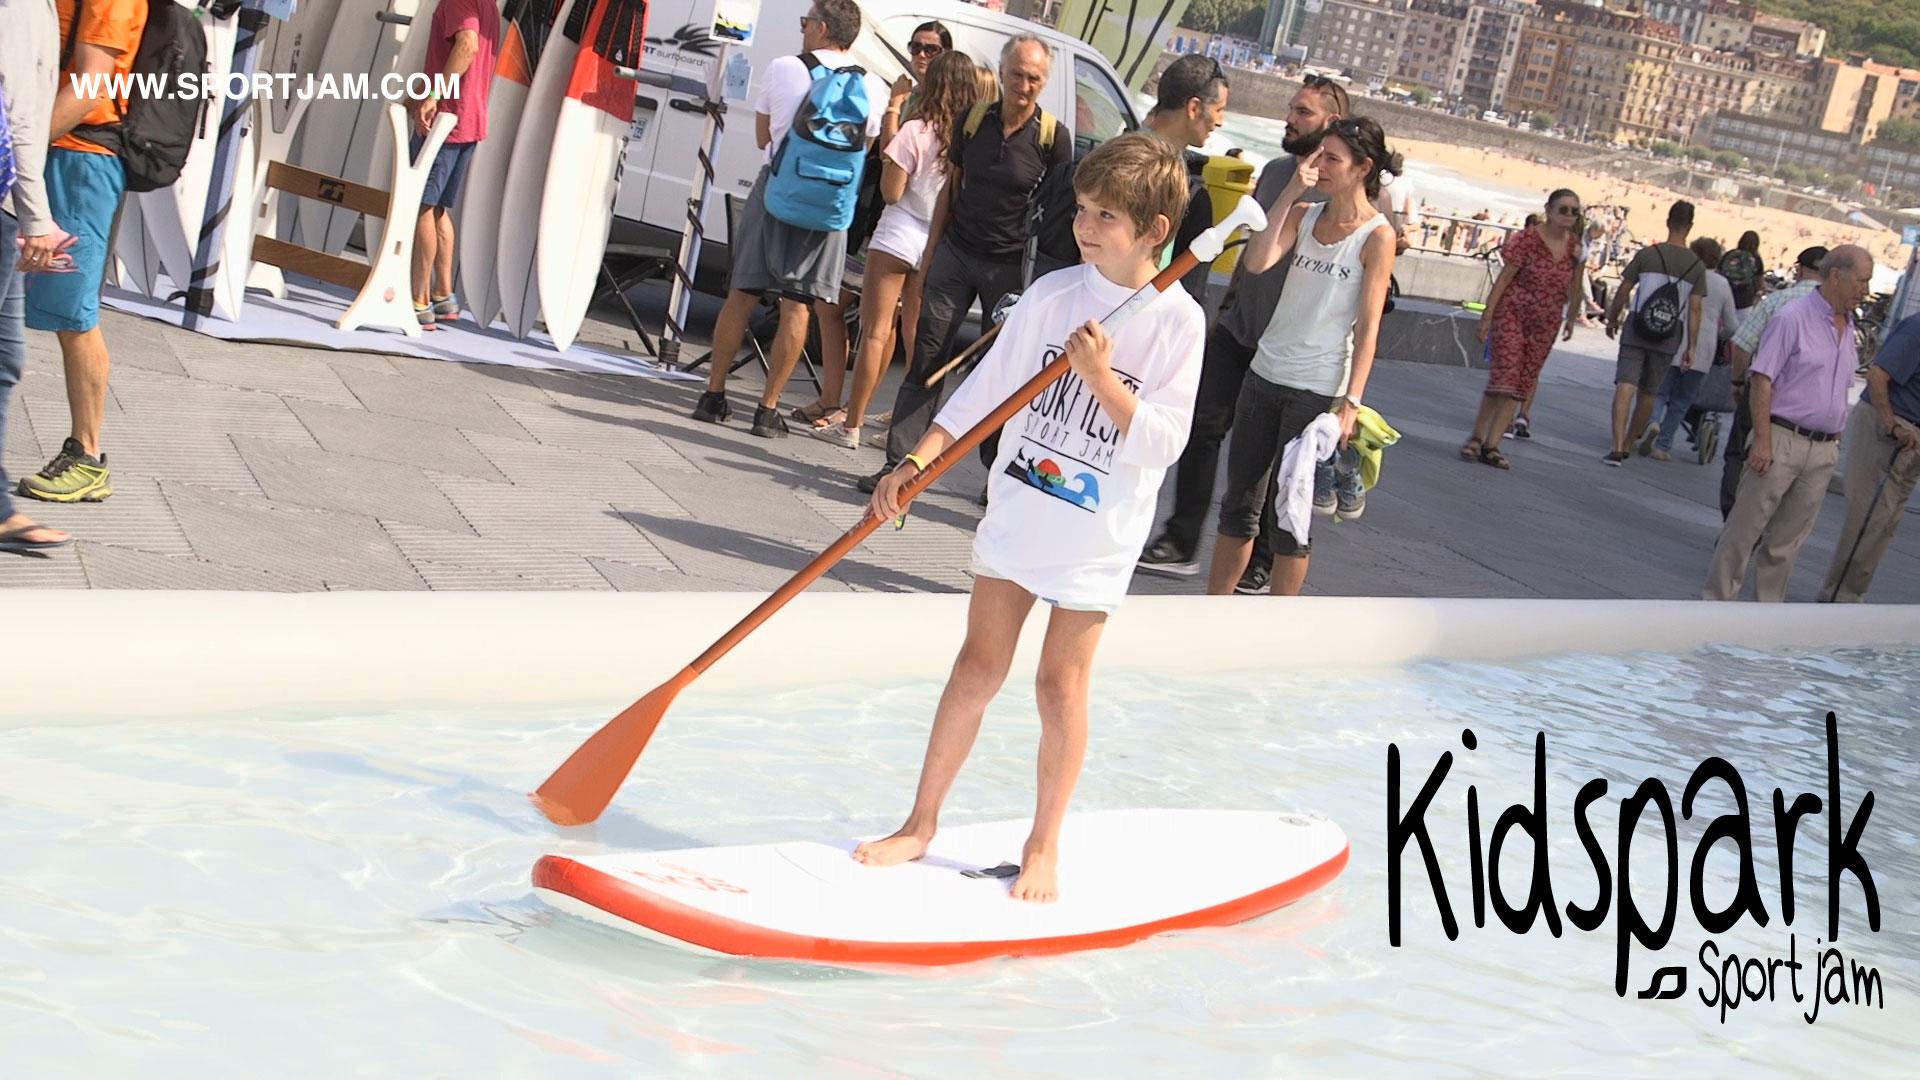 FOTOS-SPORTJAM-KIDS-PARK-surf-pool